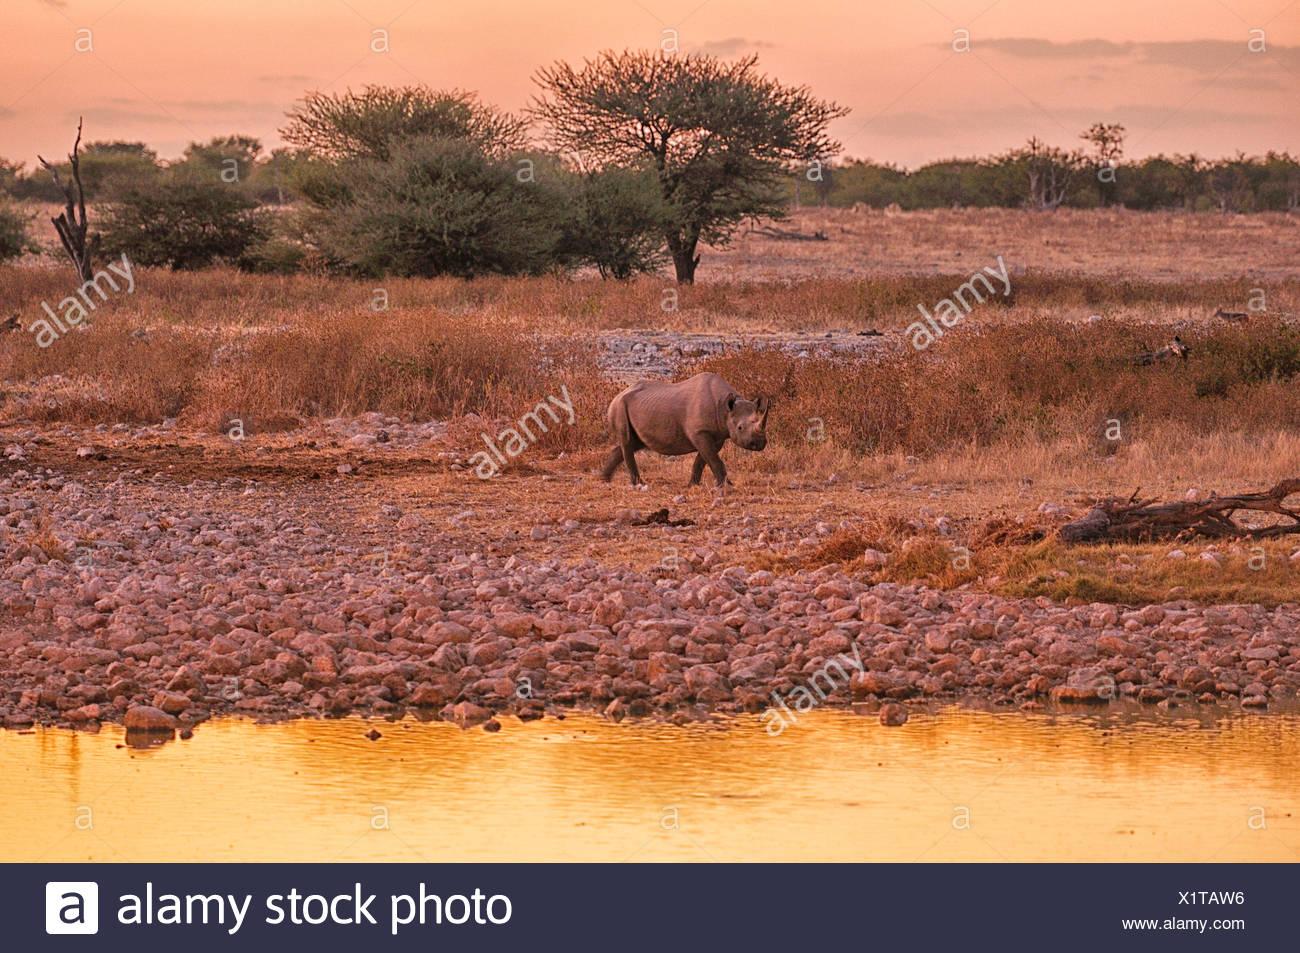 Africa, Etosha, National Park, Namibia, Warm, dusk, horizontal, rhino, animal, sundown, sunset, walking, watching, water, wateri - Stock Image